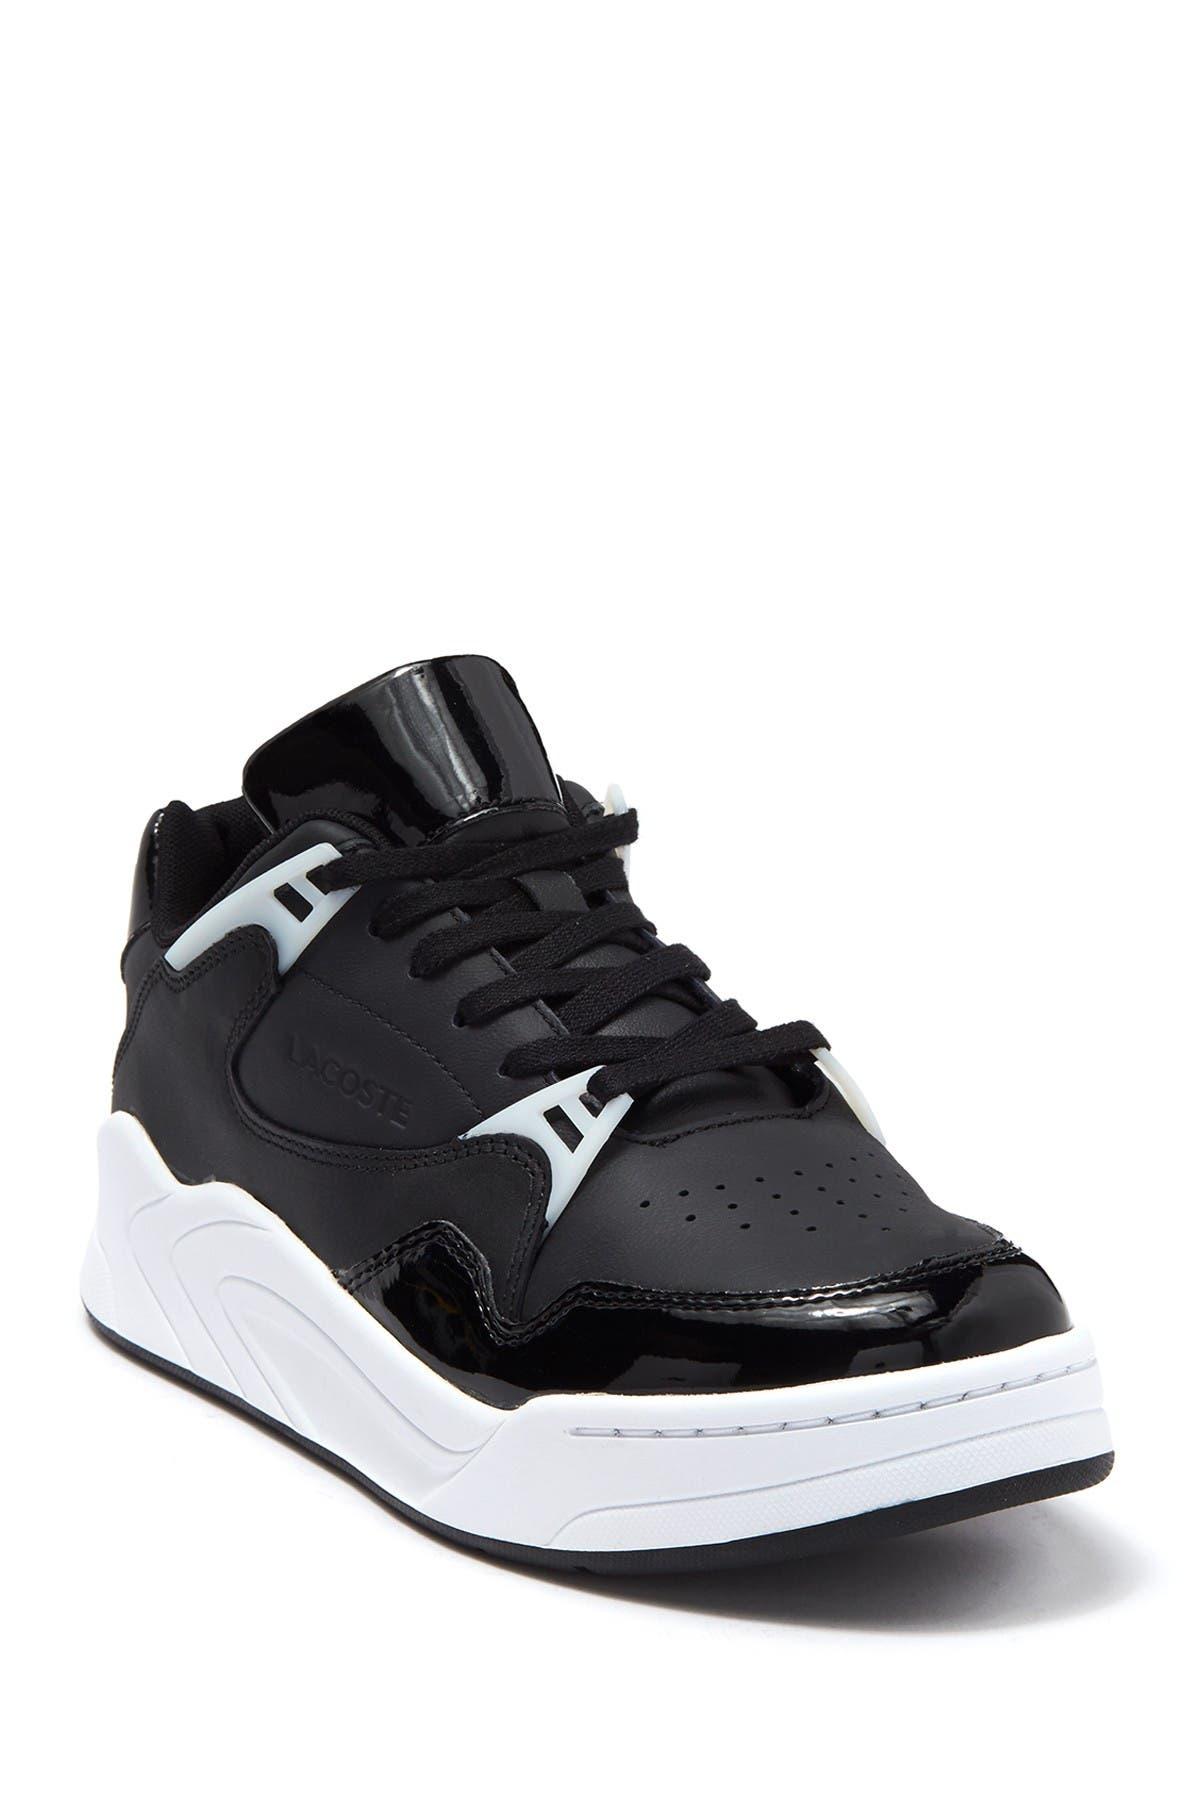 Image of Lacoste Court Slam Sneaker